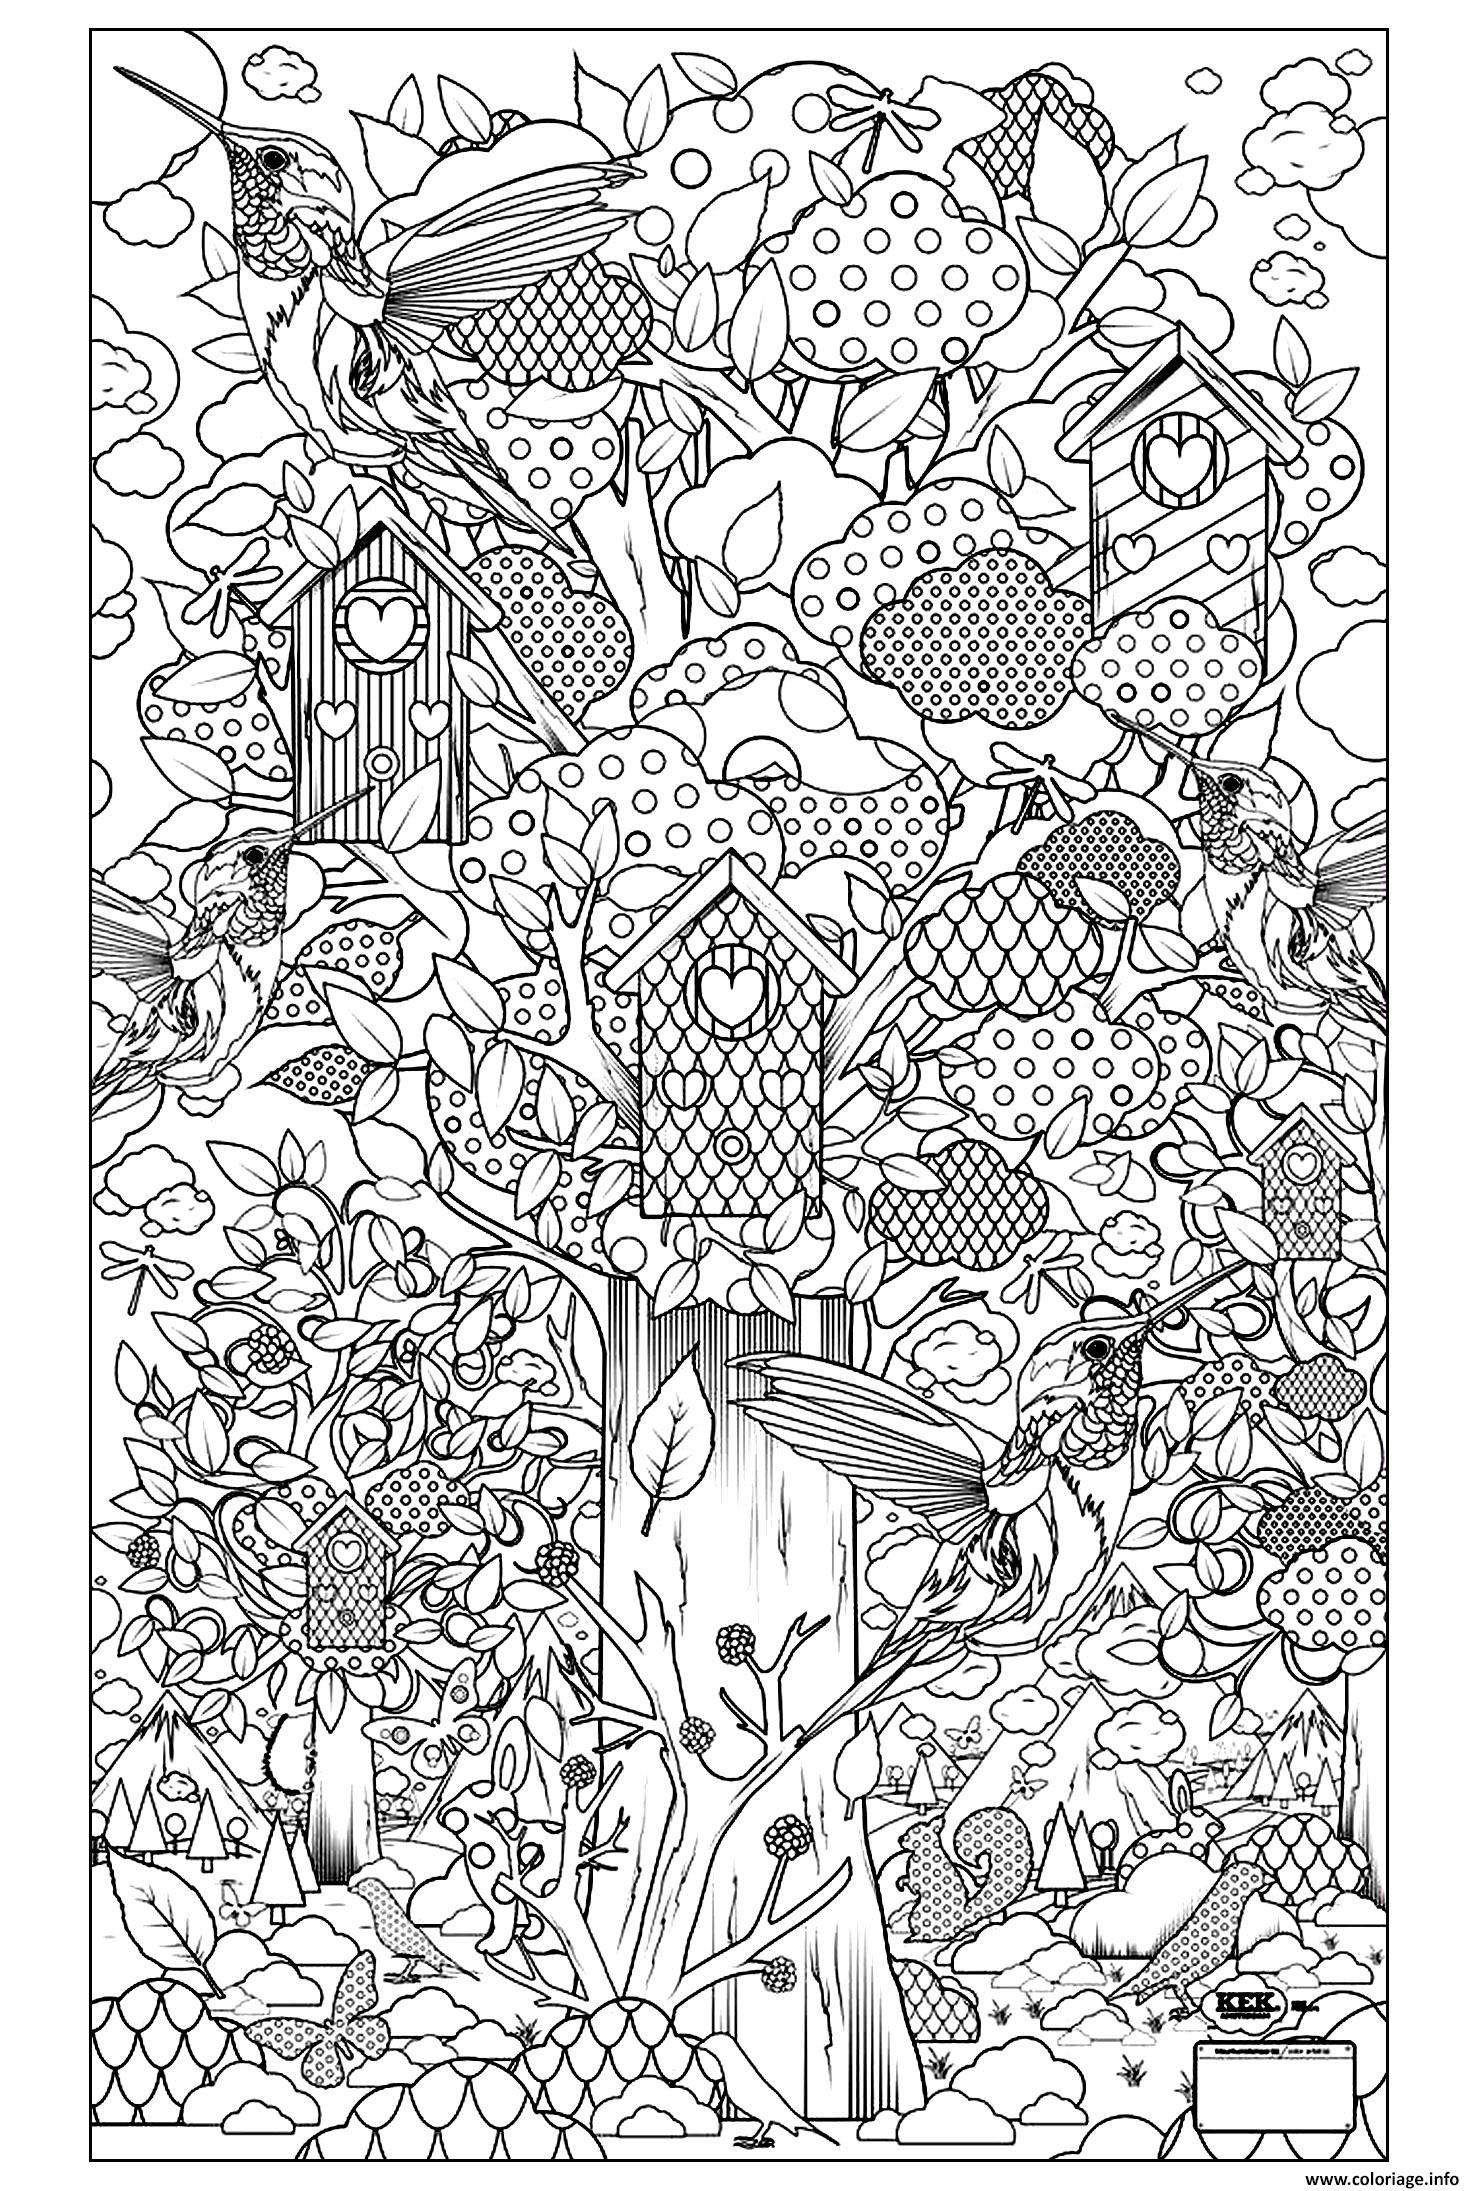 Coloriage adulte animaux oiseaux cabane dessin - Dessin cabane ...